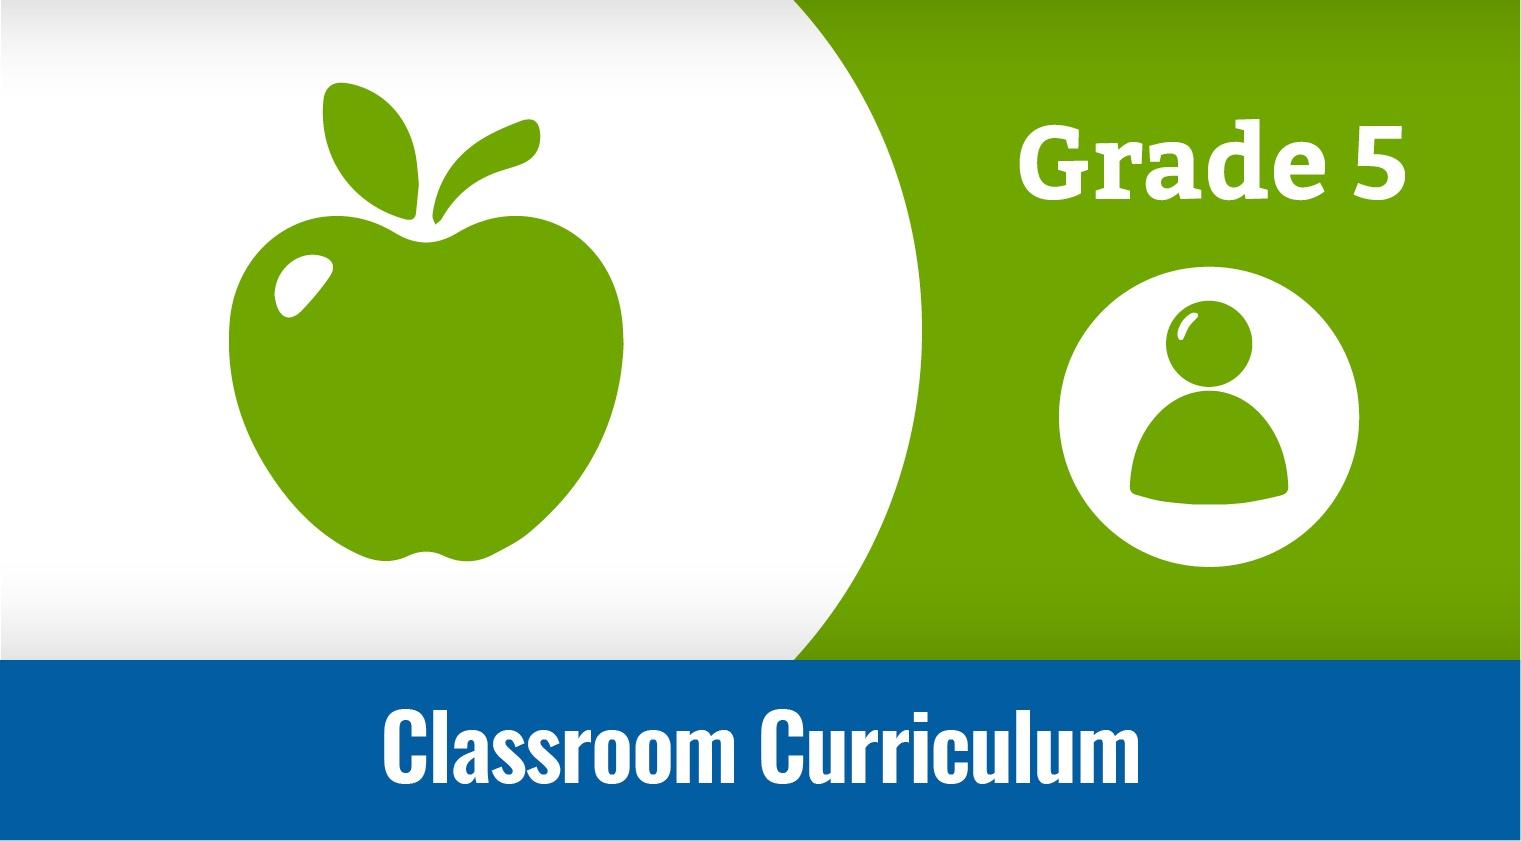 Grade 5 Classroom Curriculum - Breaking Through Barriers